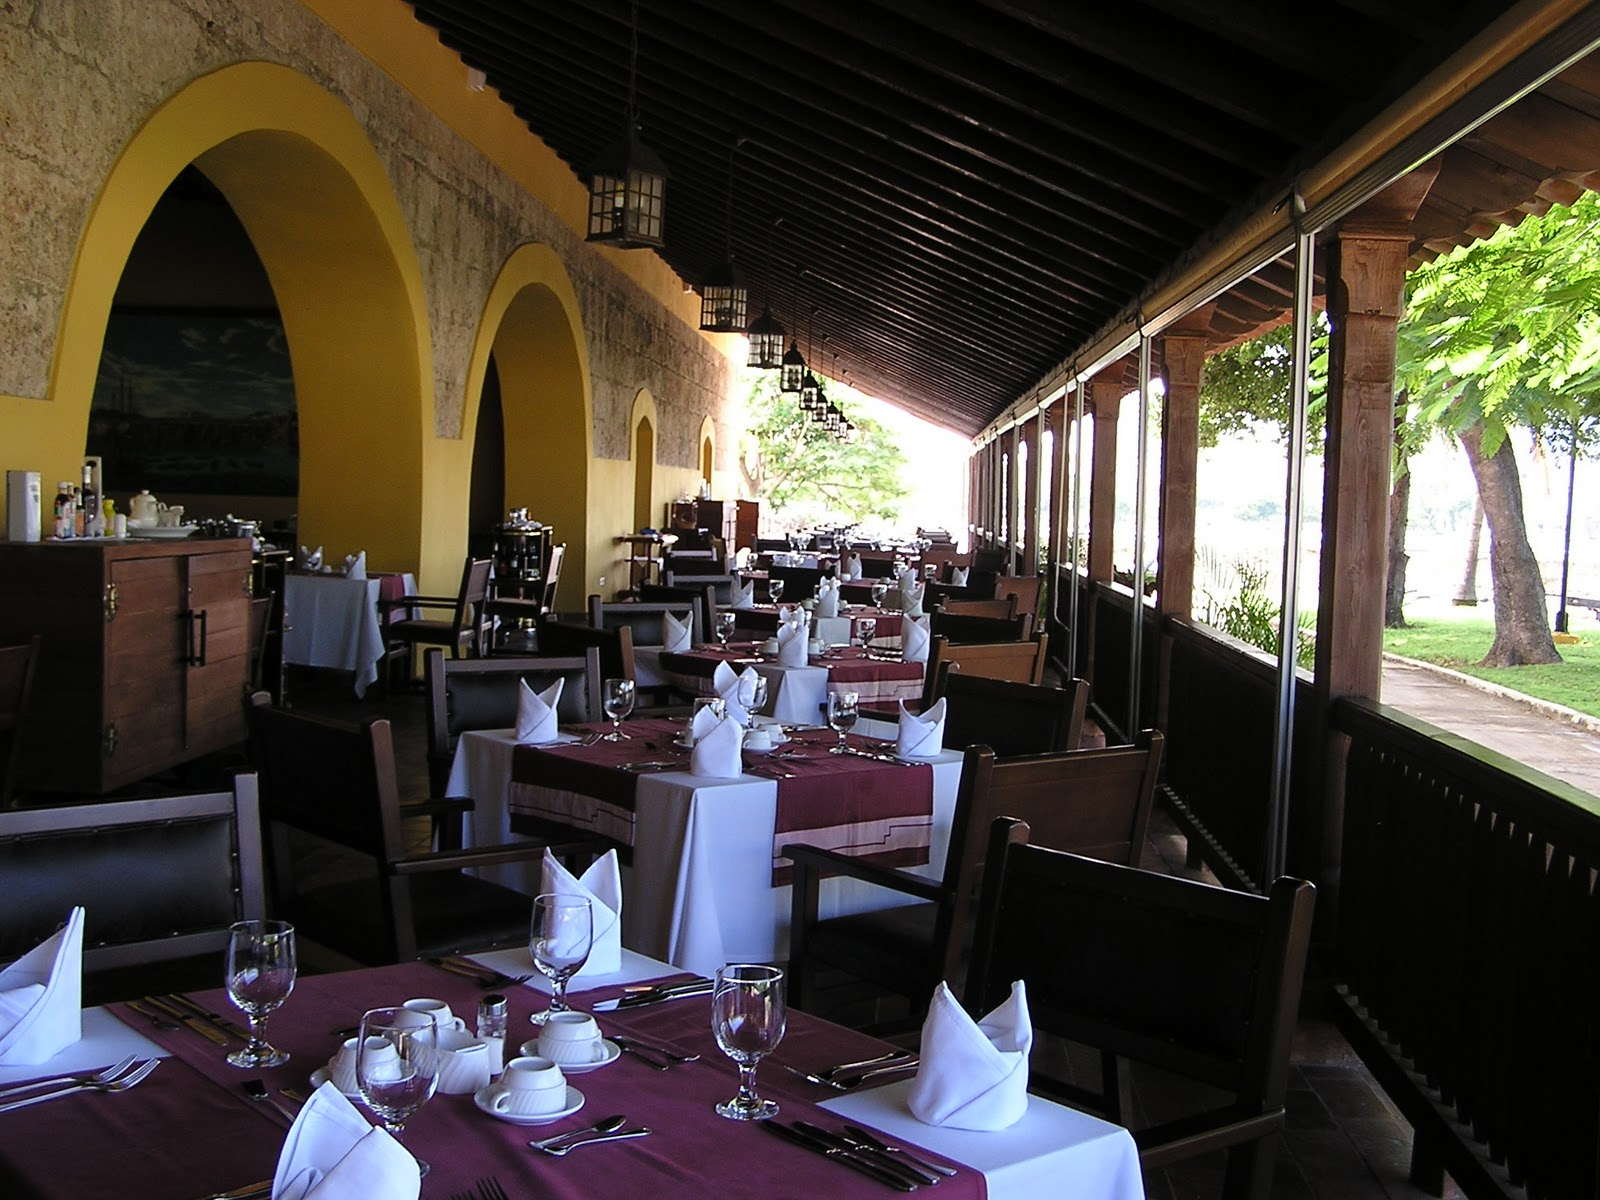 Tara s dolce vita restaurante la ina pastora havana cuba